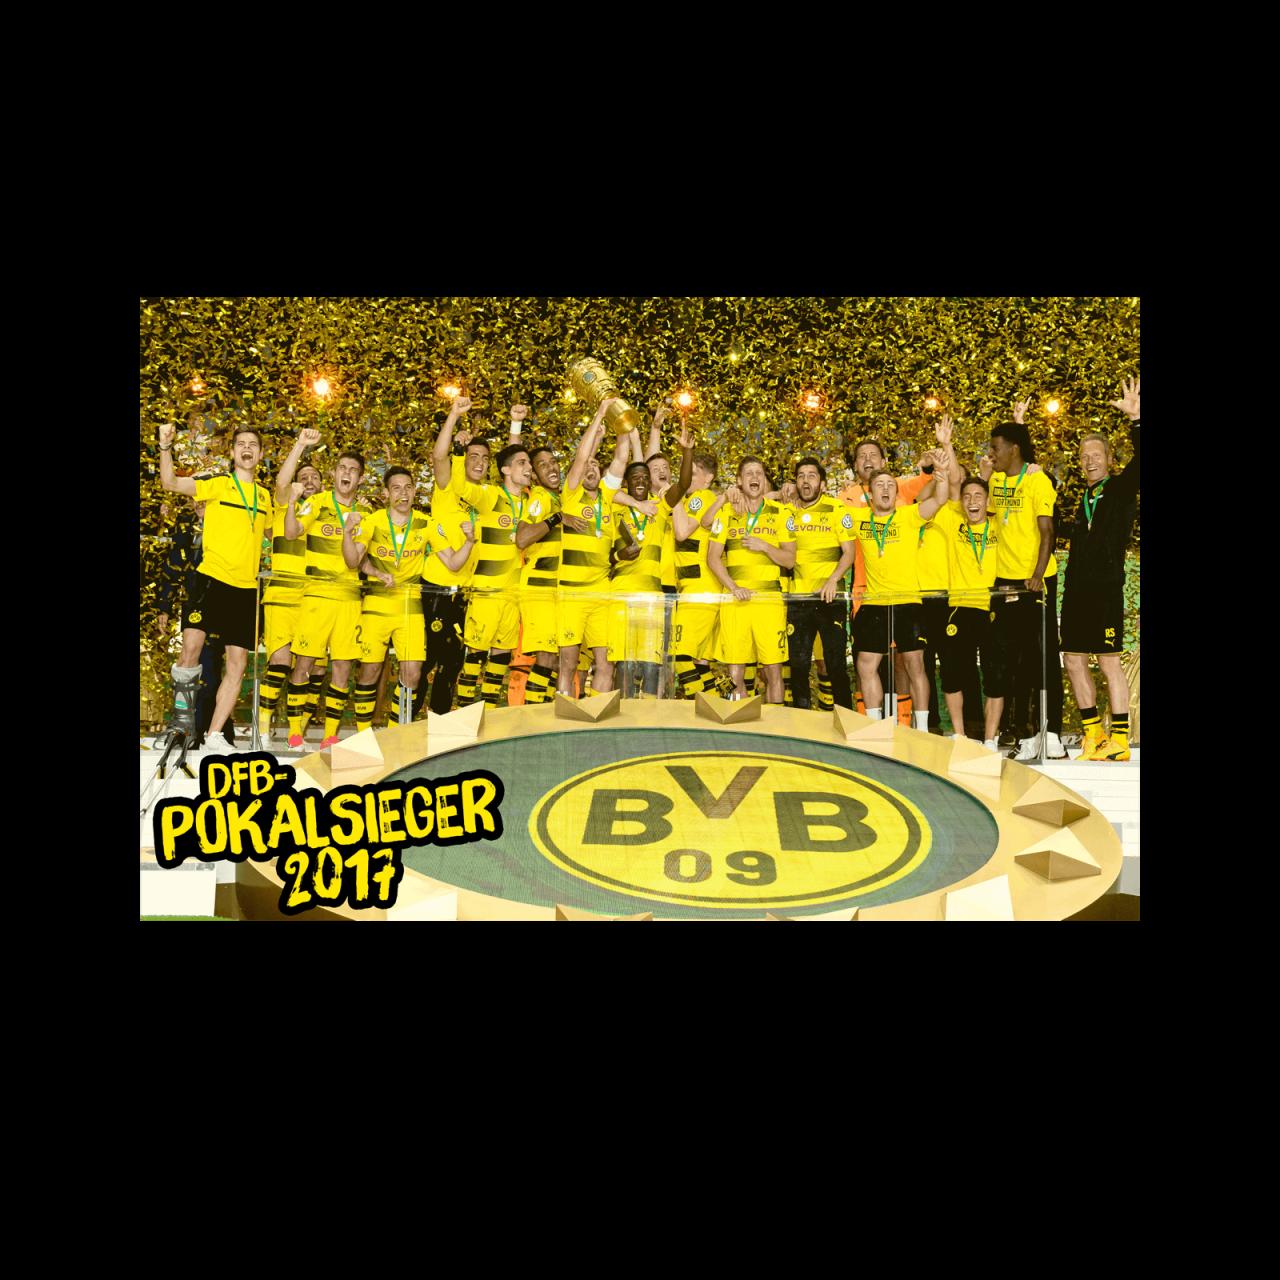 BVB-Kunstdruck DFB-Pokalsieger 2017